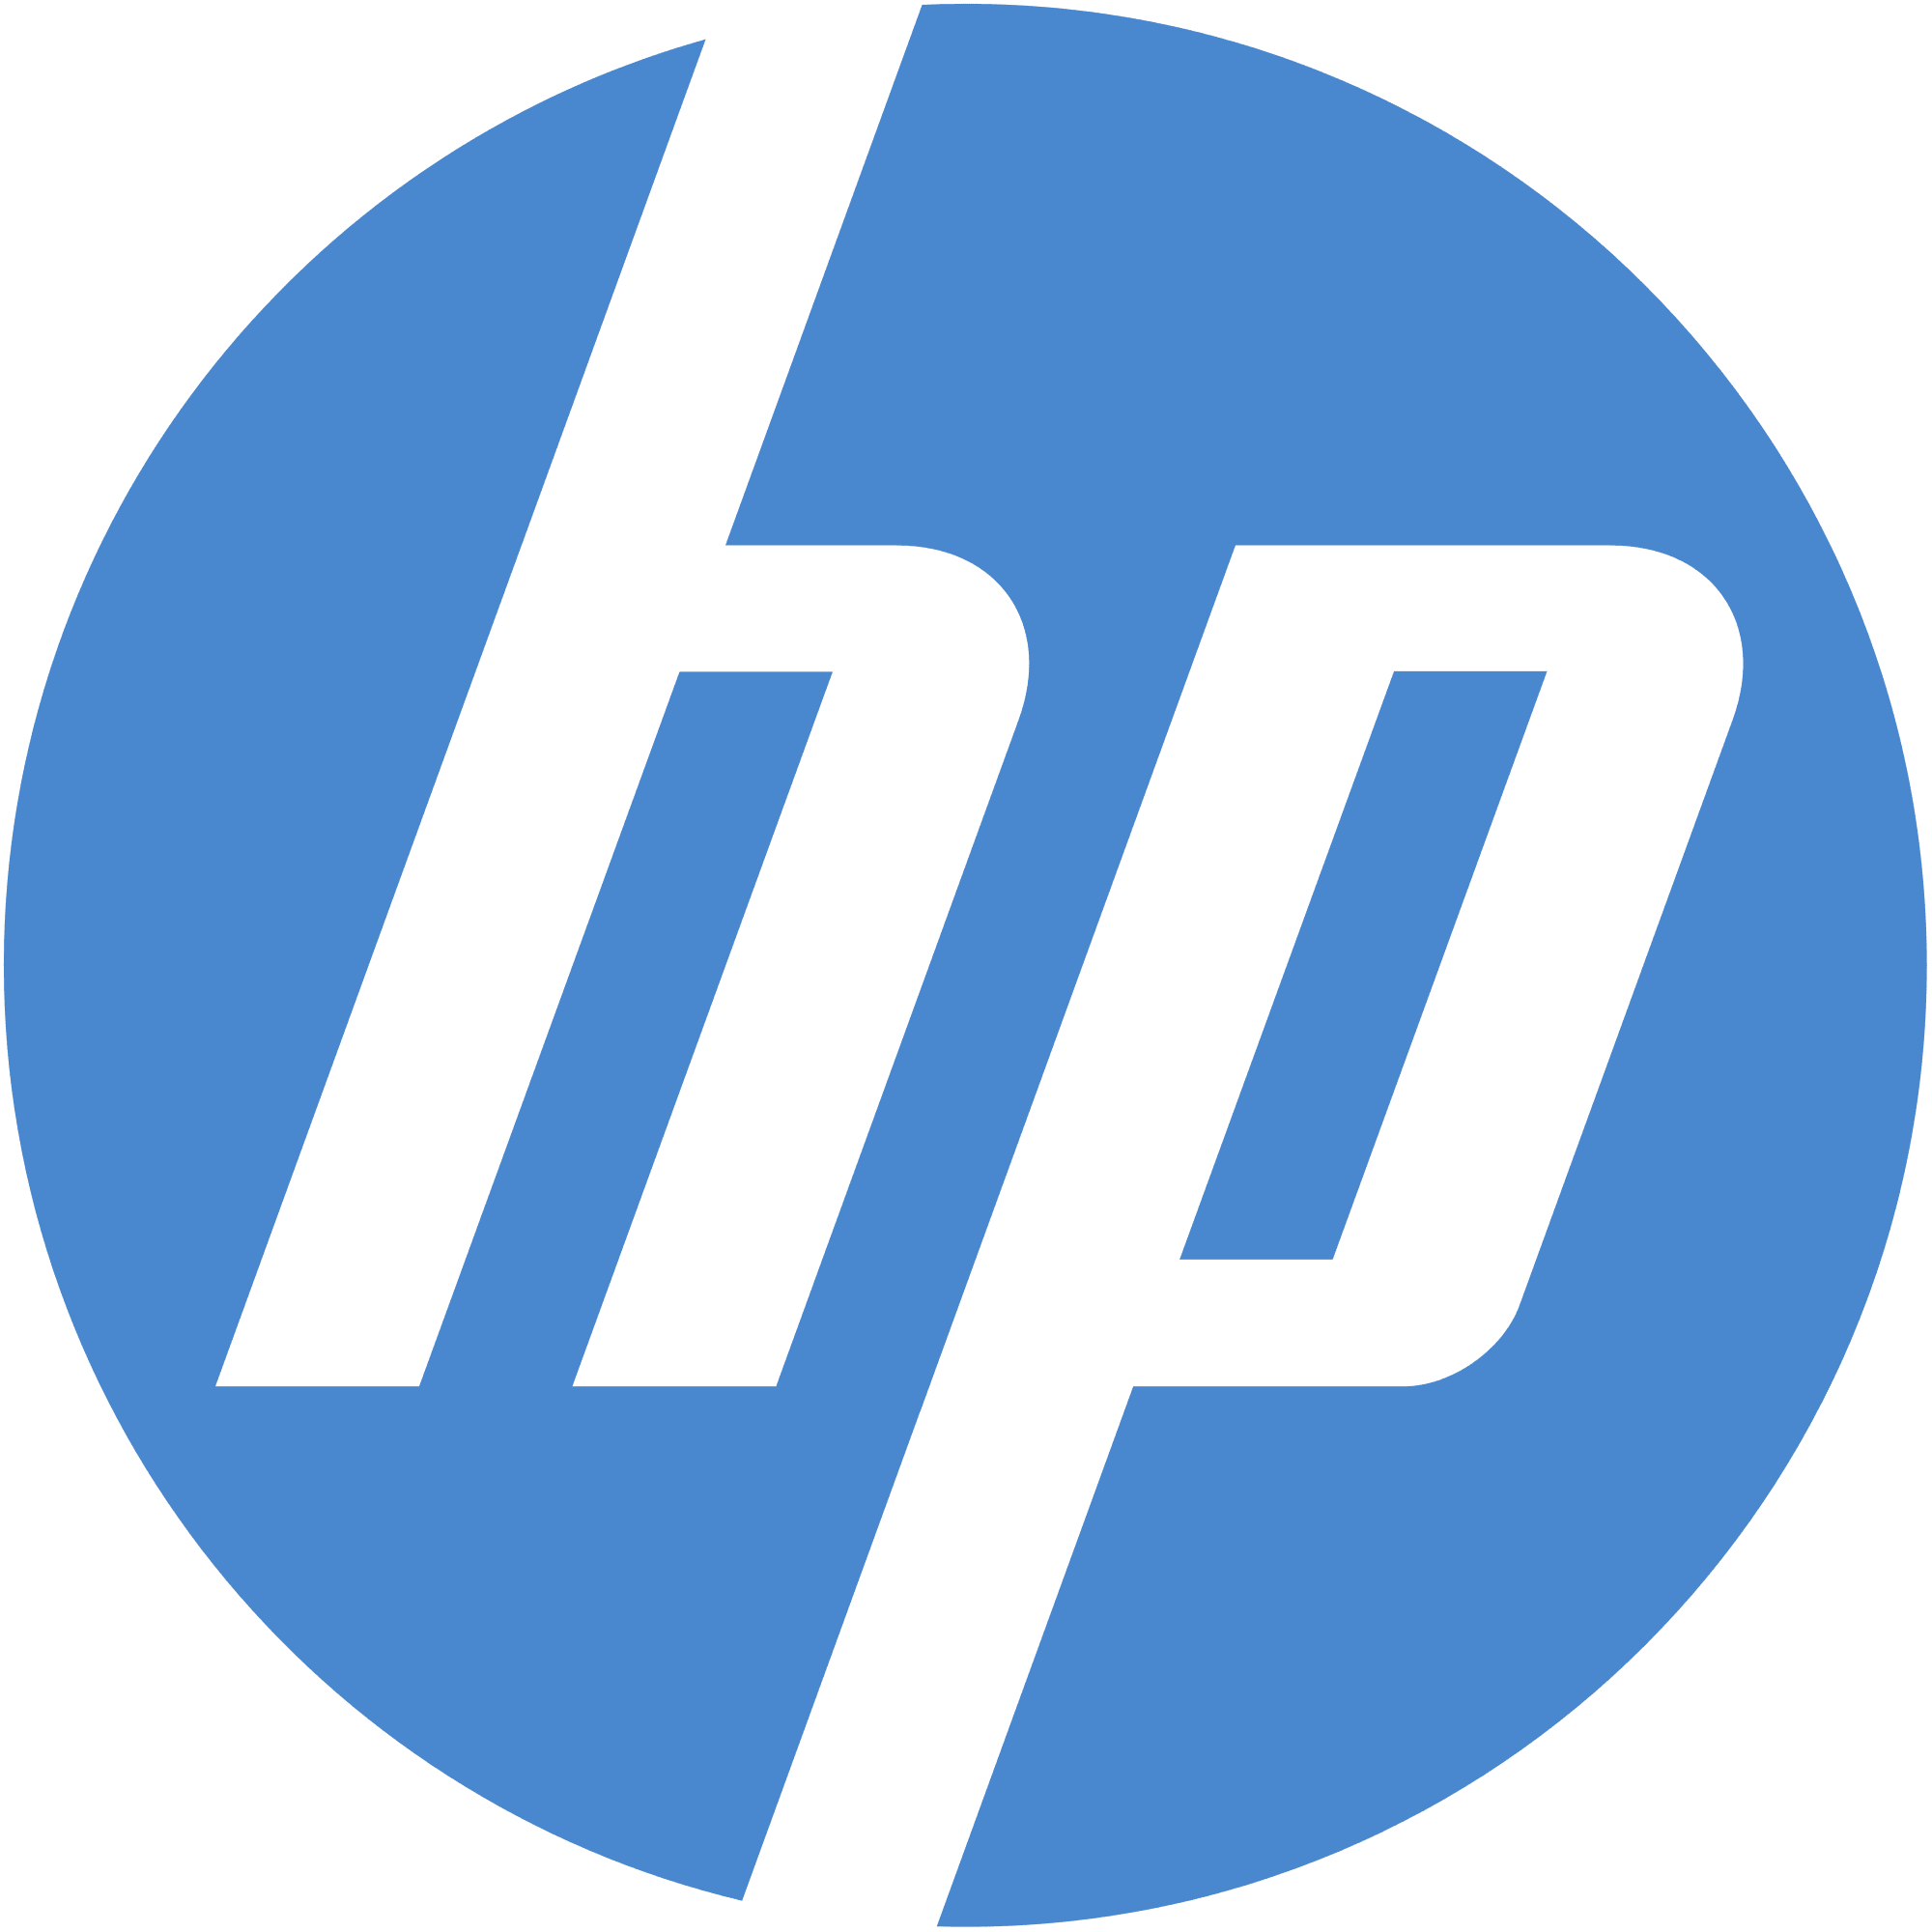 HP S2031a 20-inch Diagonal LCD Monitor drivers